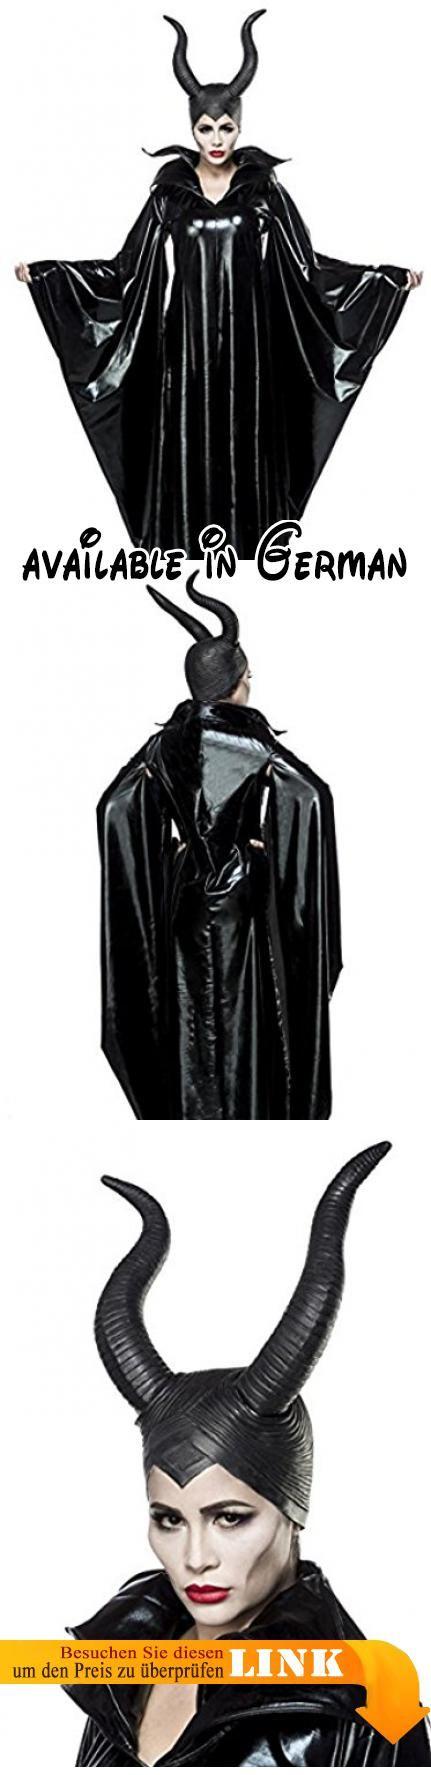 Sexy 2 teiliges Maleficent Lady Kostüm mit Maske Damenkostüm Malefiz Märchen Fee Böse Karneval Fasching Set Komplettset Wetlook. Cape: 94% Polyester, 6%Elasthan, Hörnermaske: Gummi #Apparel #ADULT_COSTUME